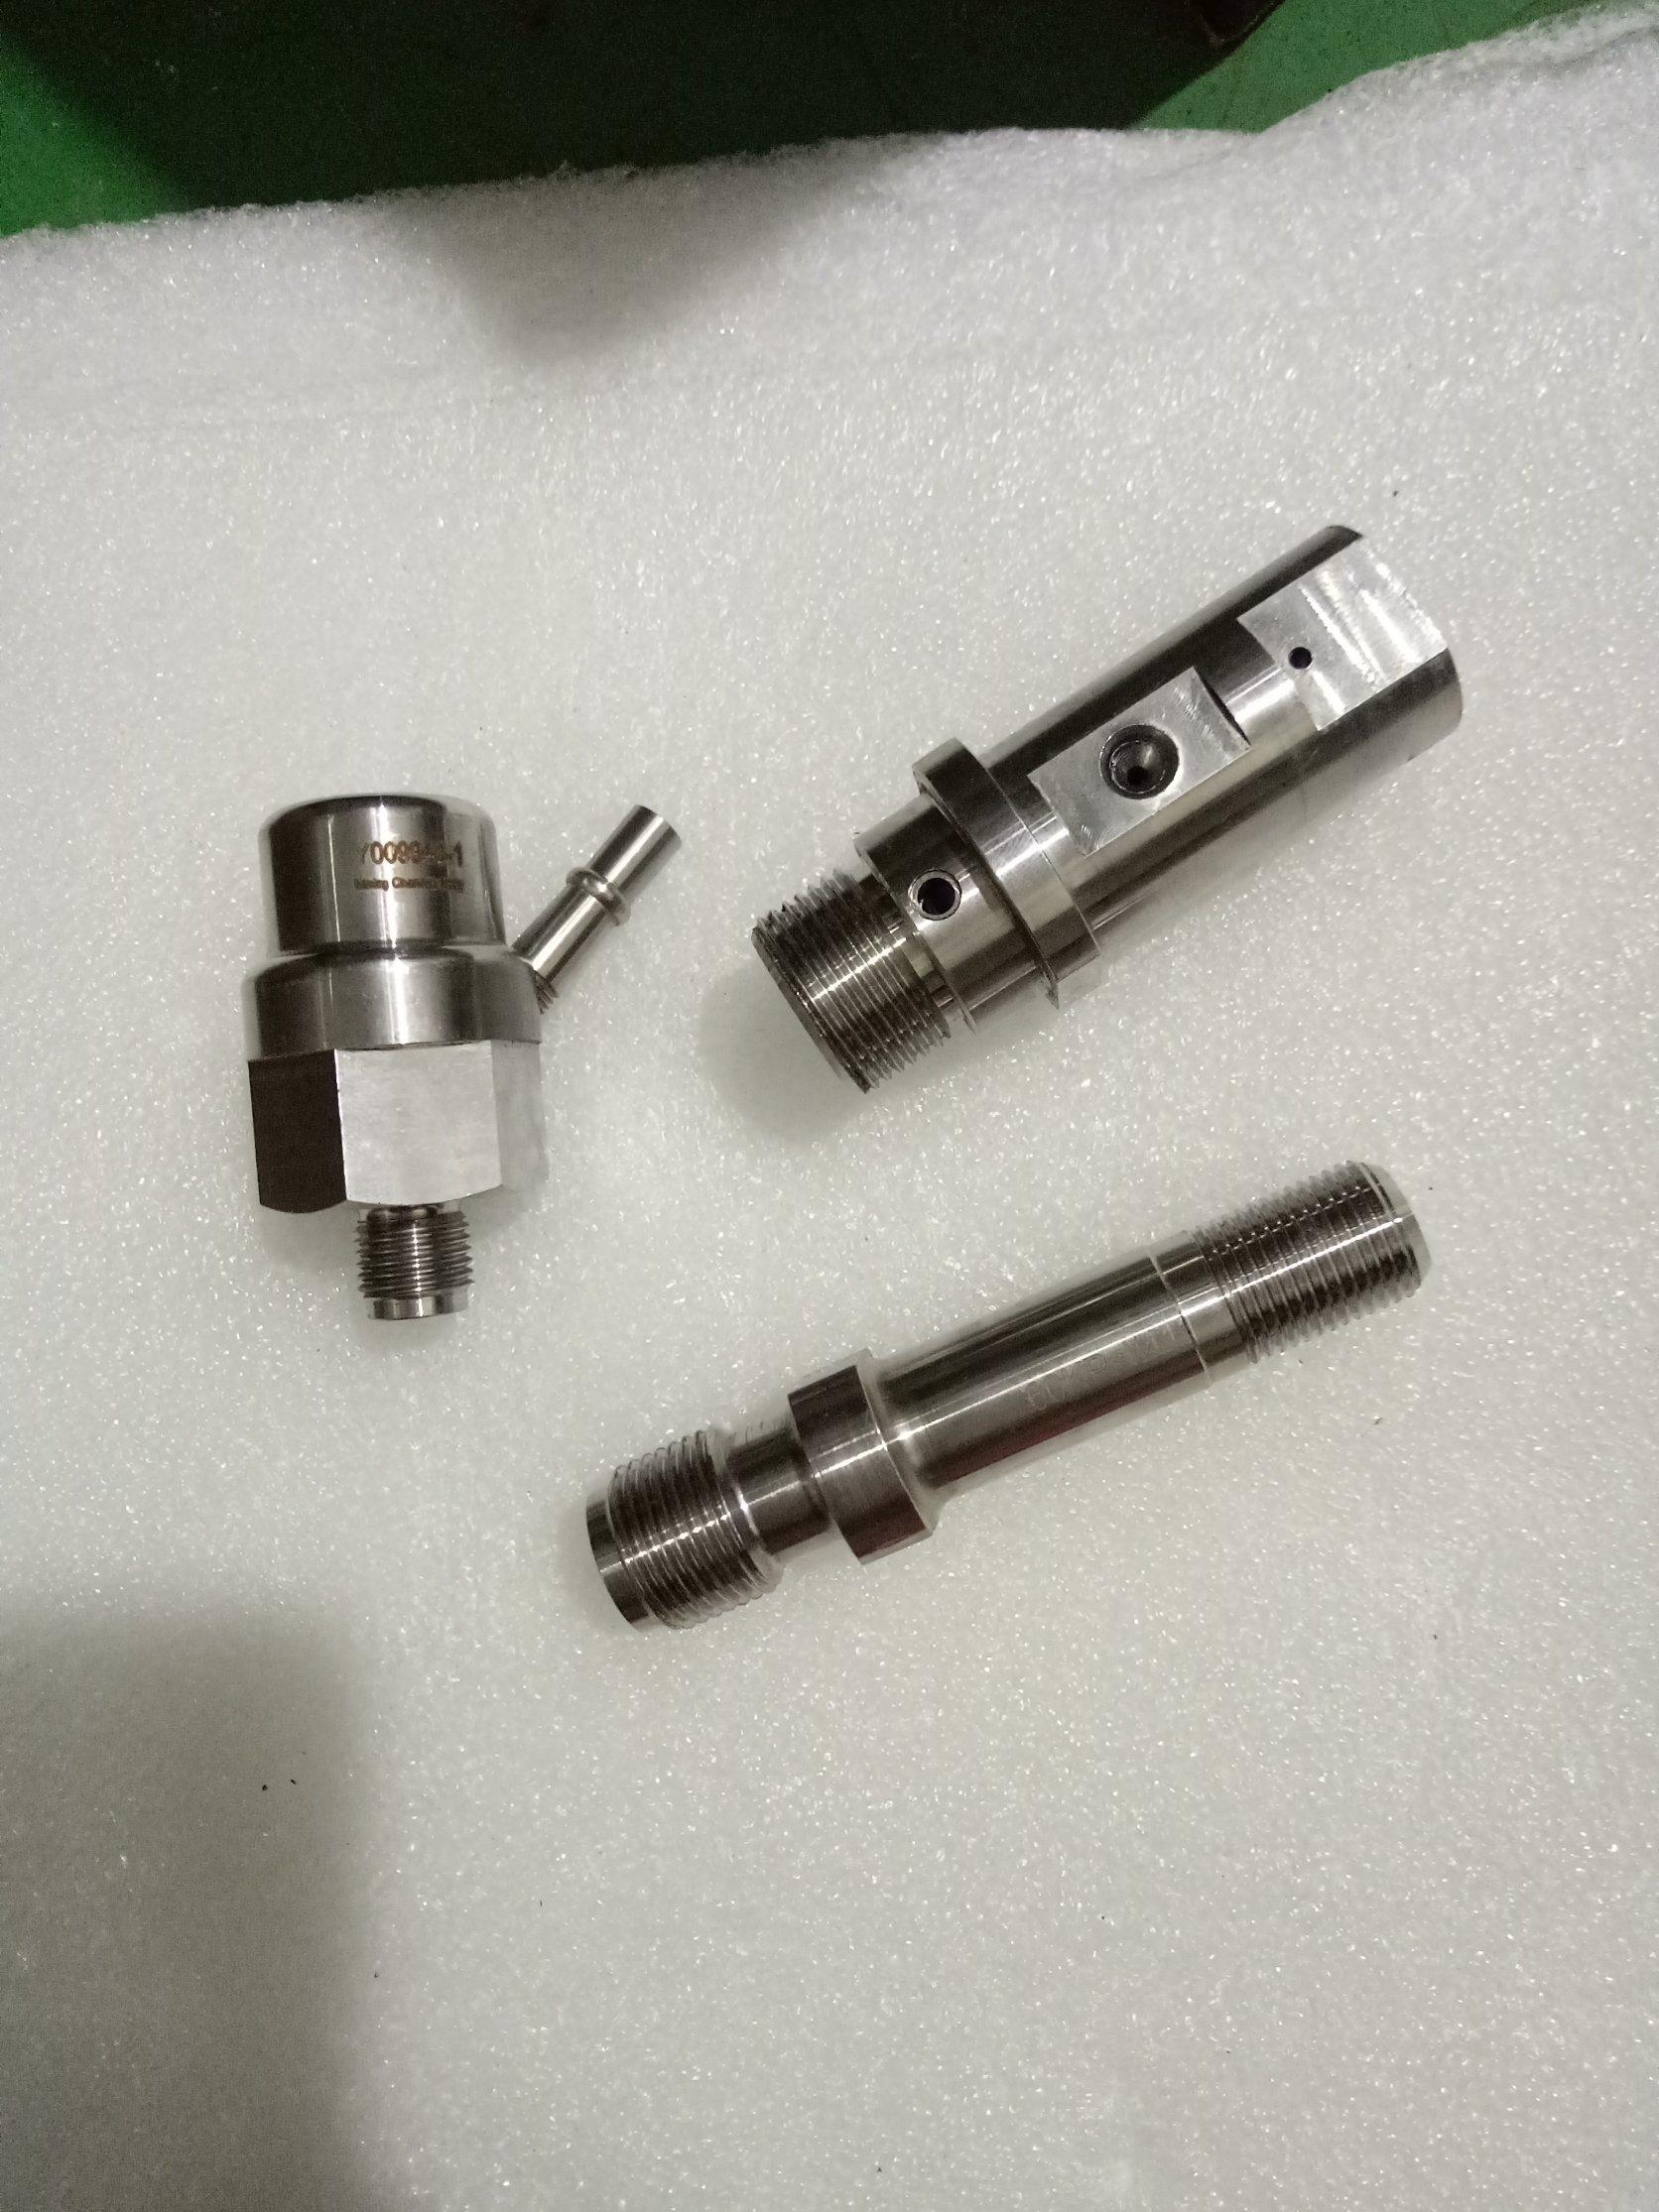 Paser Three Cutting Head for Water Jet Cutting Machine